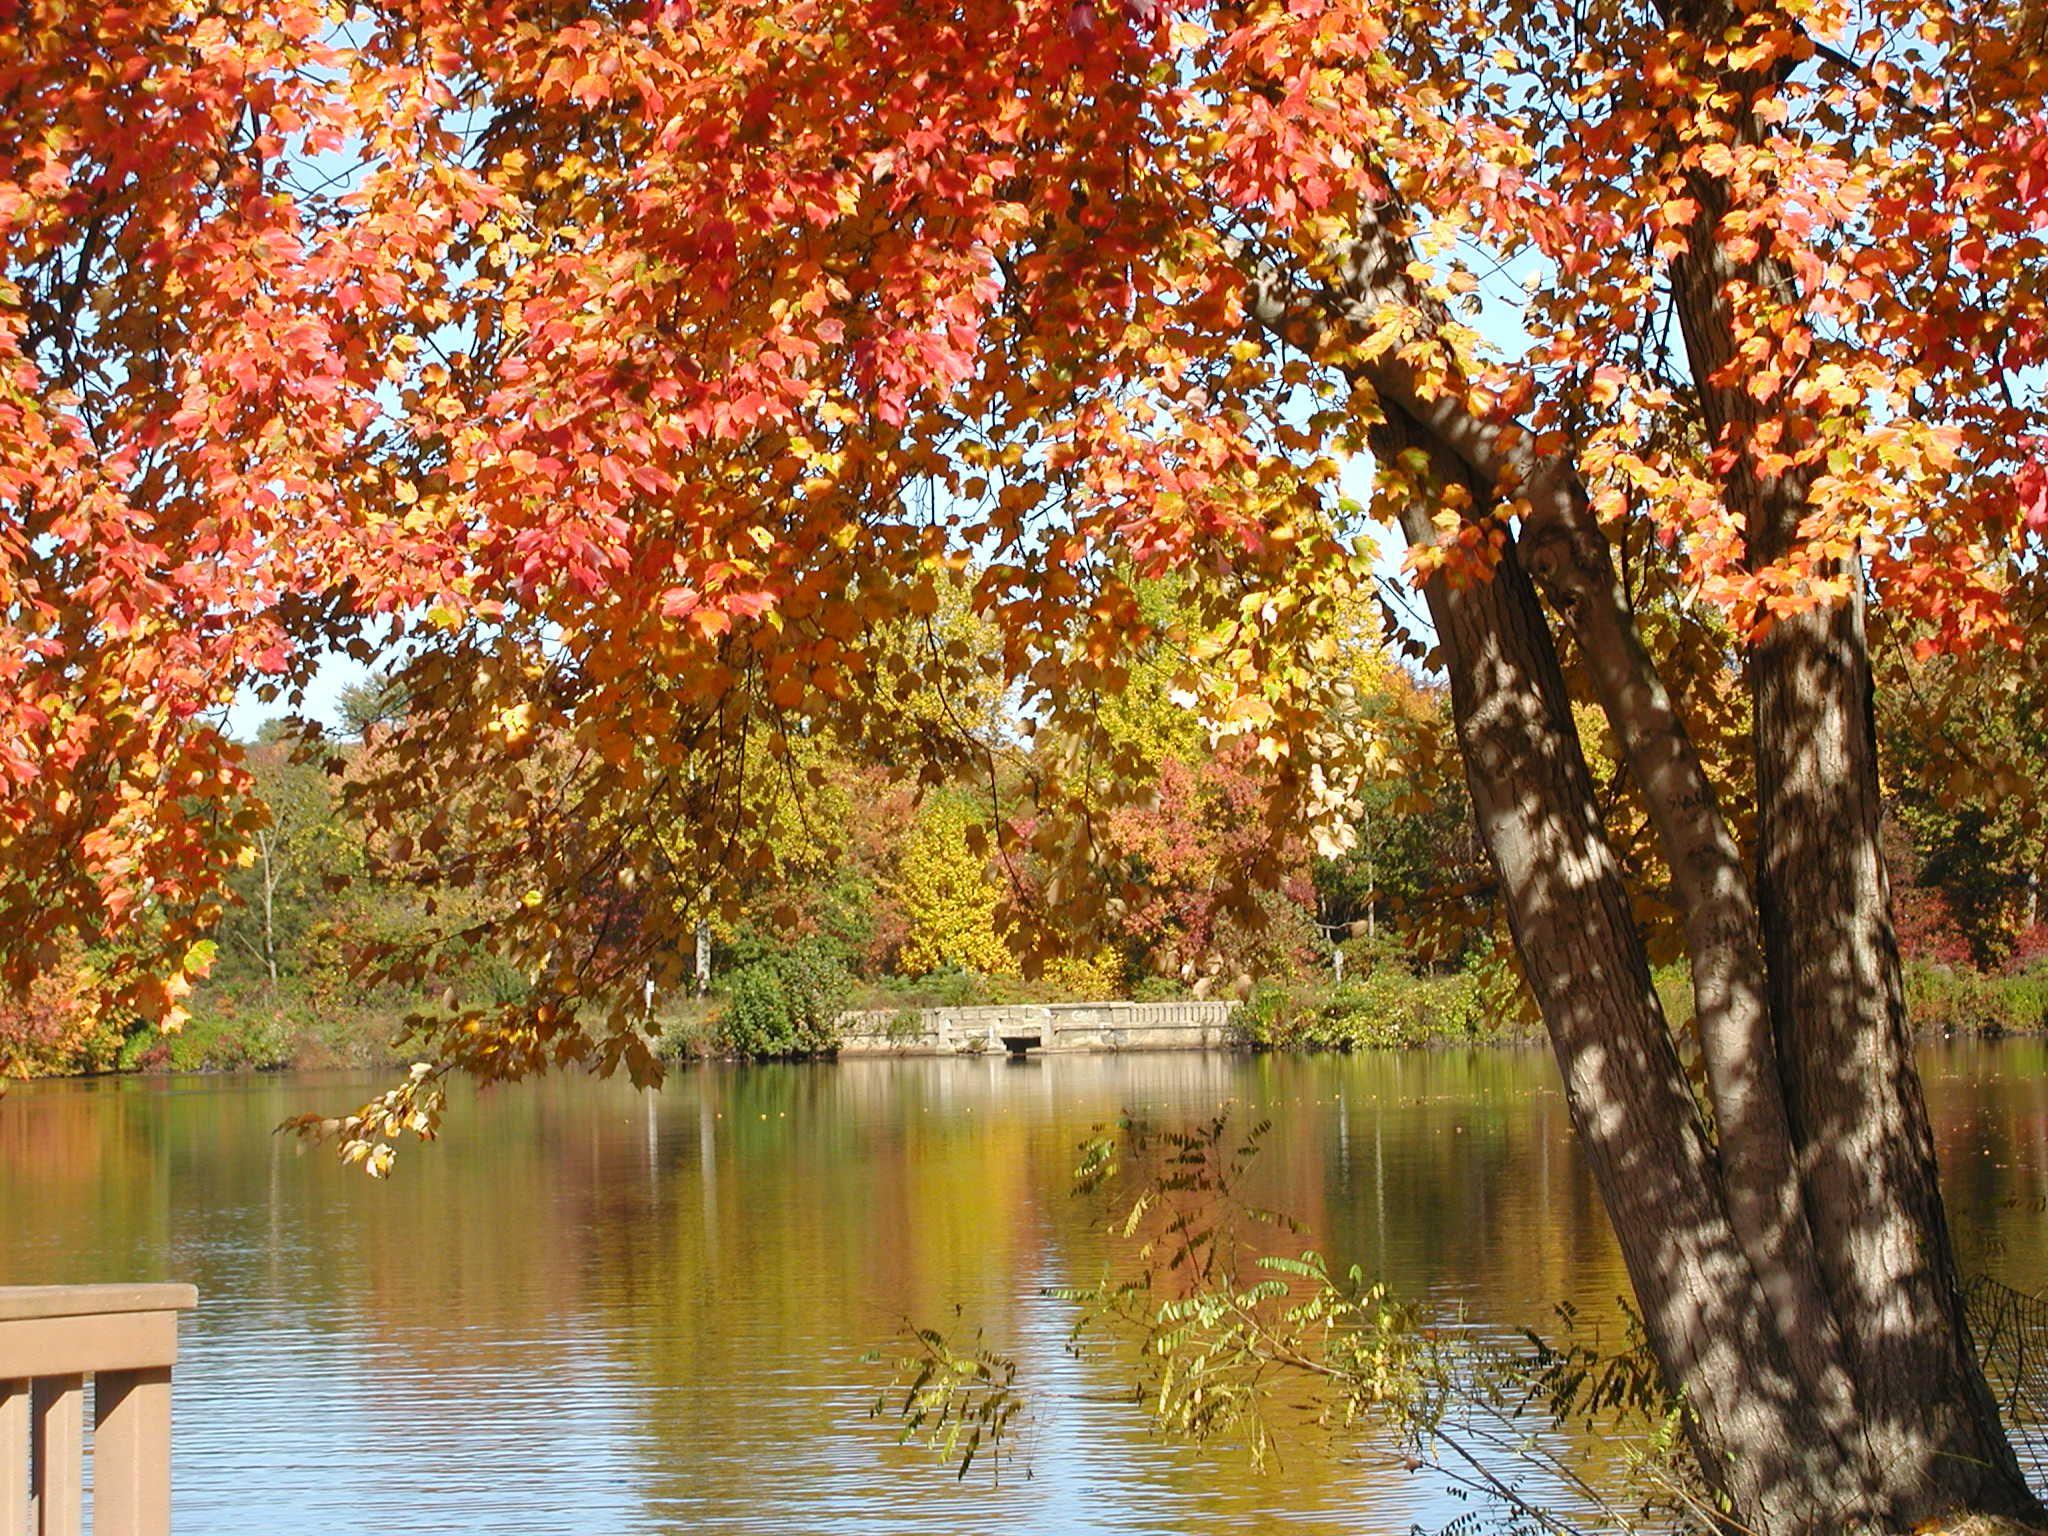 Autumn at bells lake in greenwood park turnersville nj